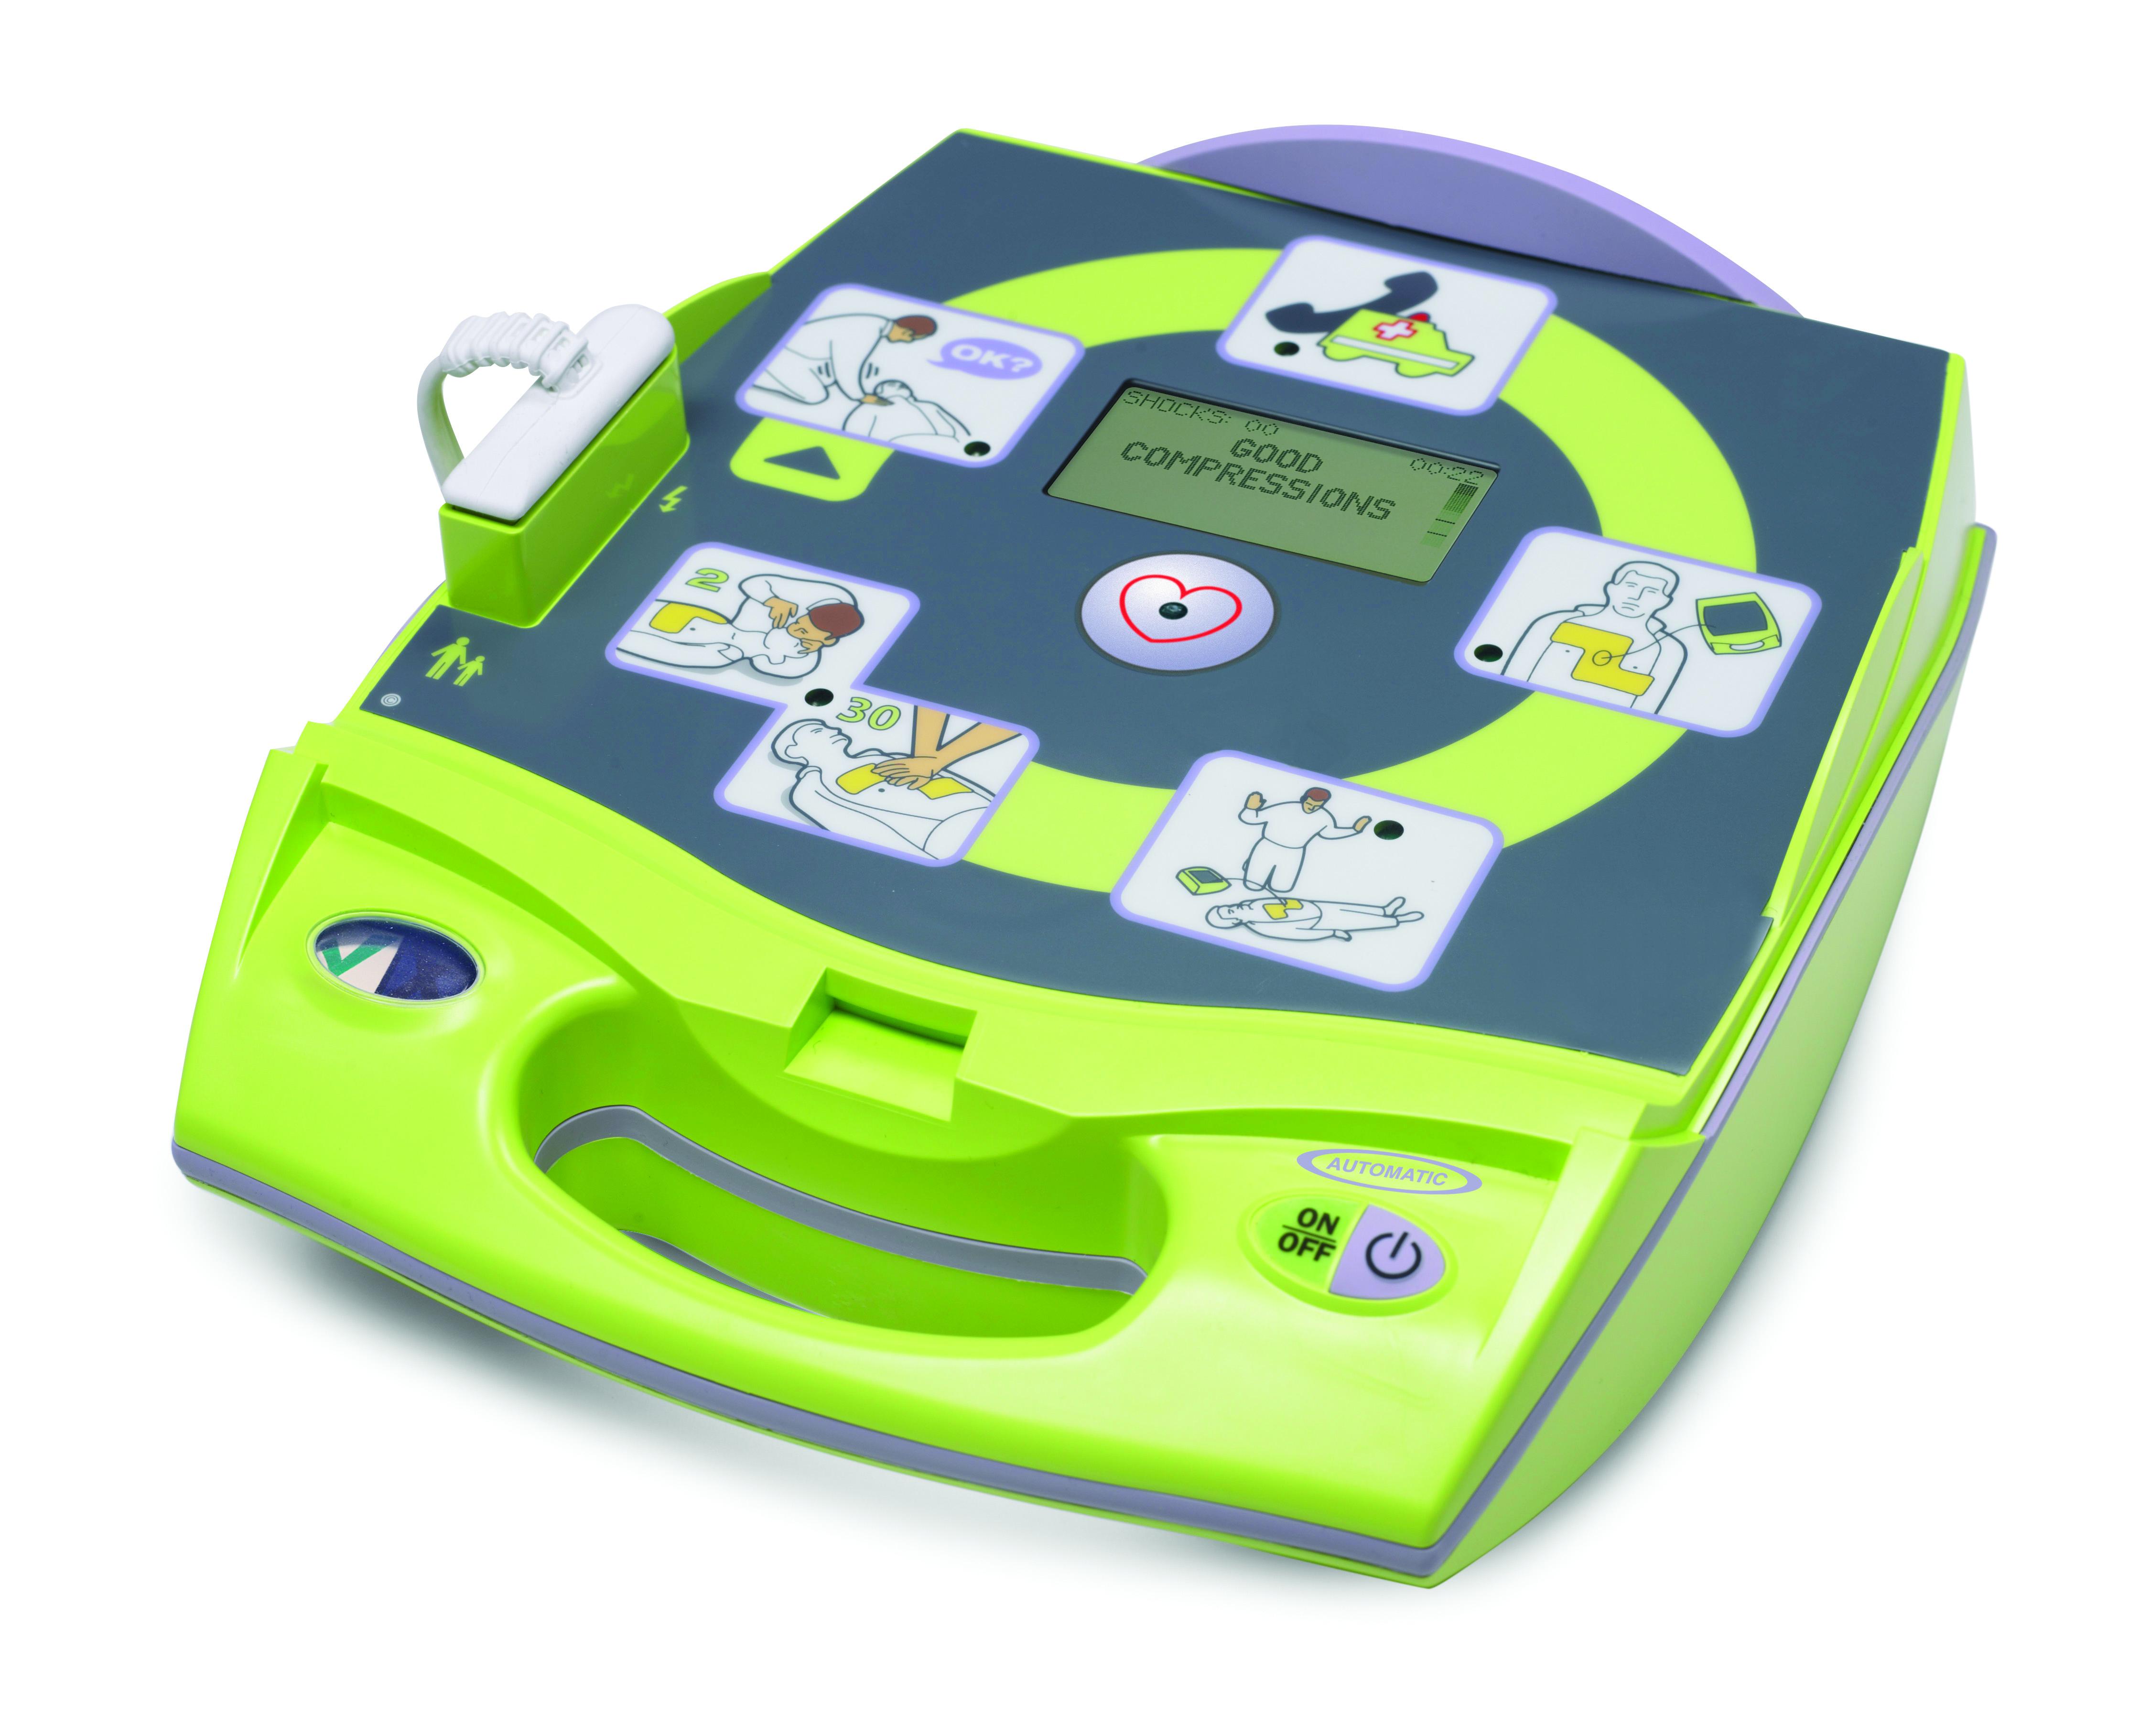 AED Plus Fully Automatic Defibrillator